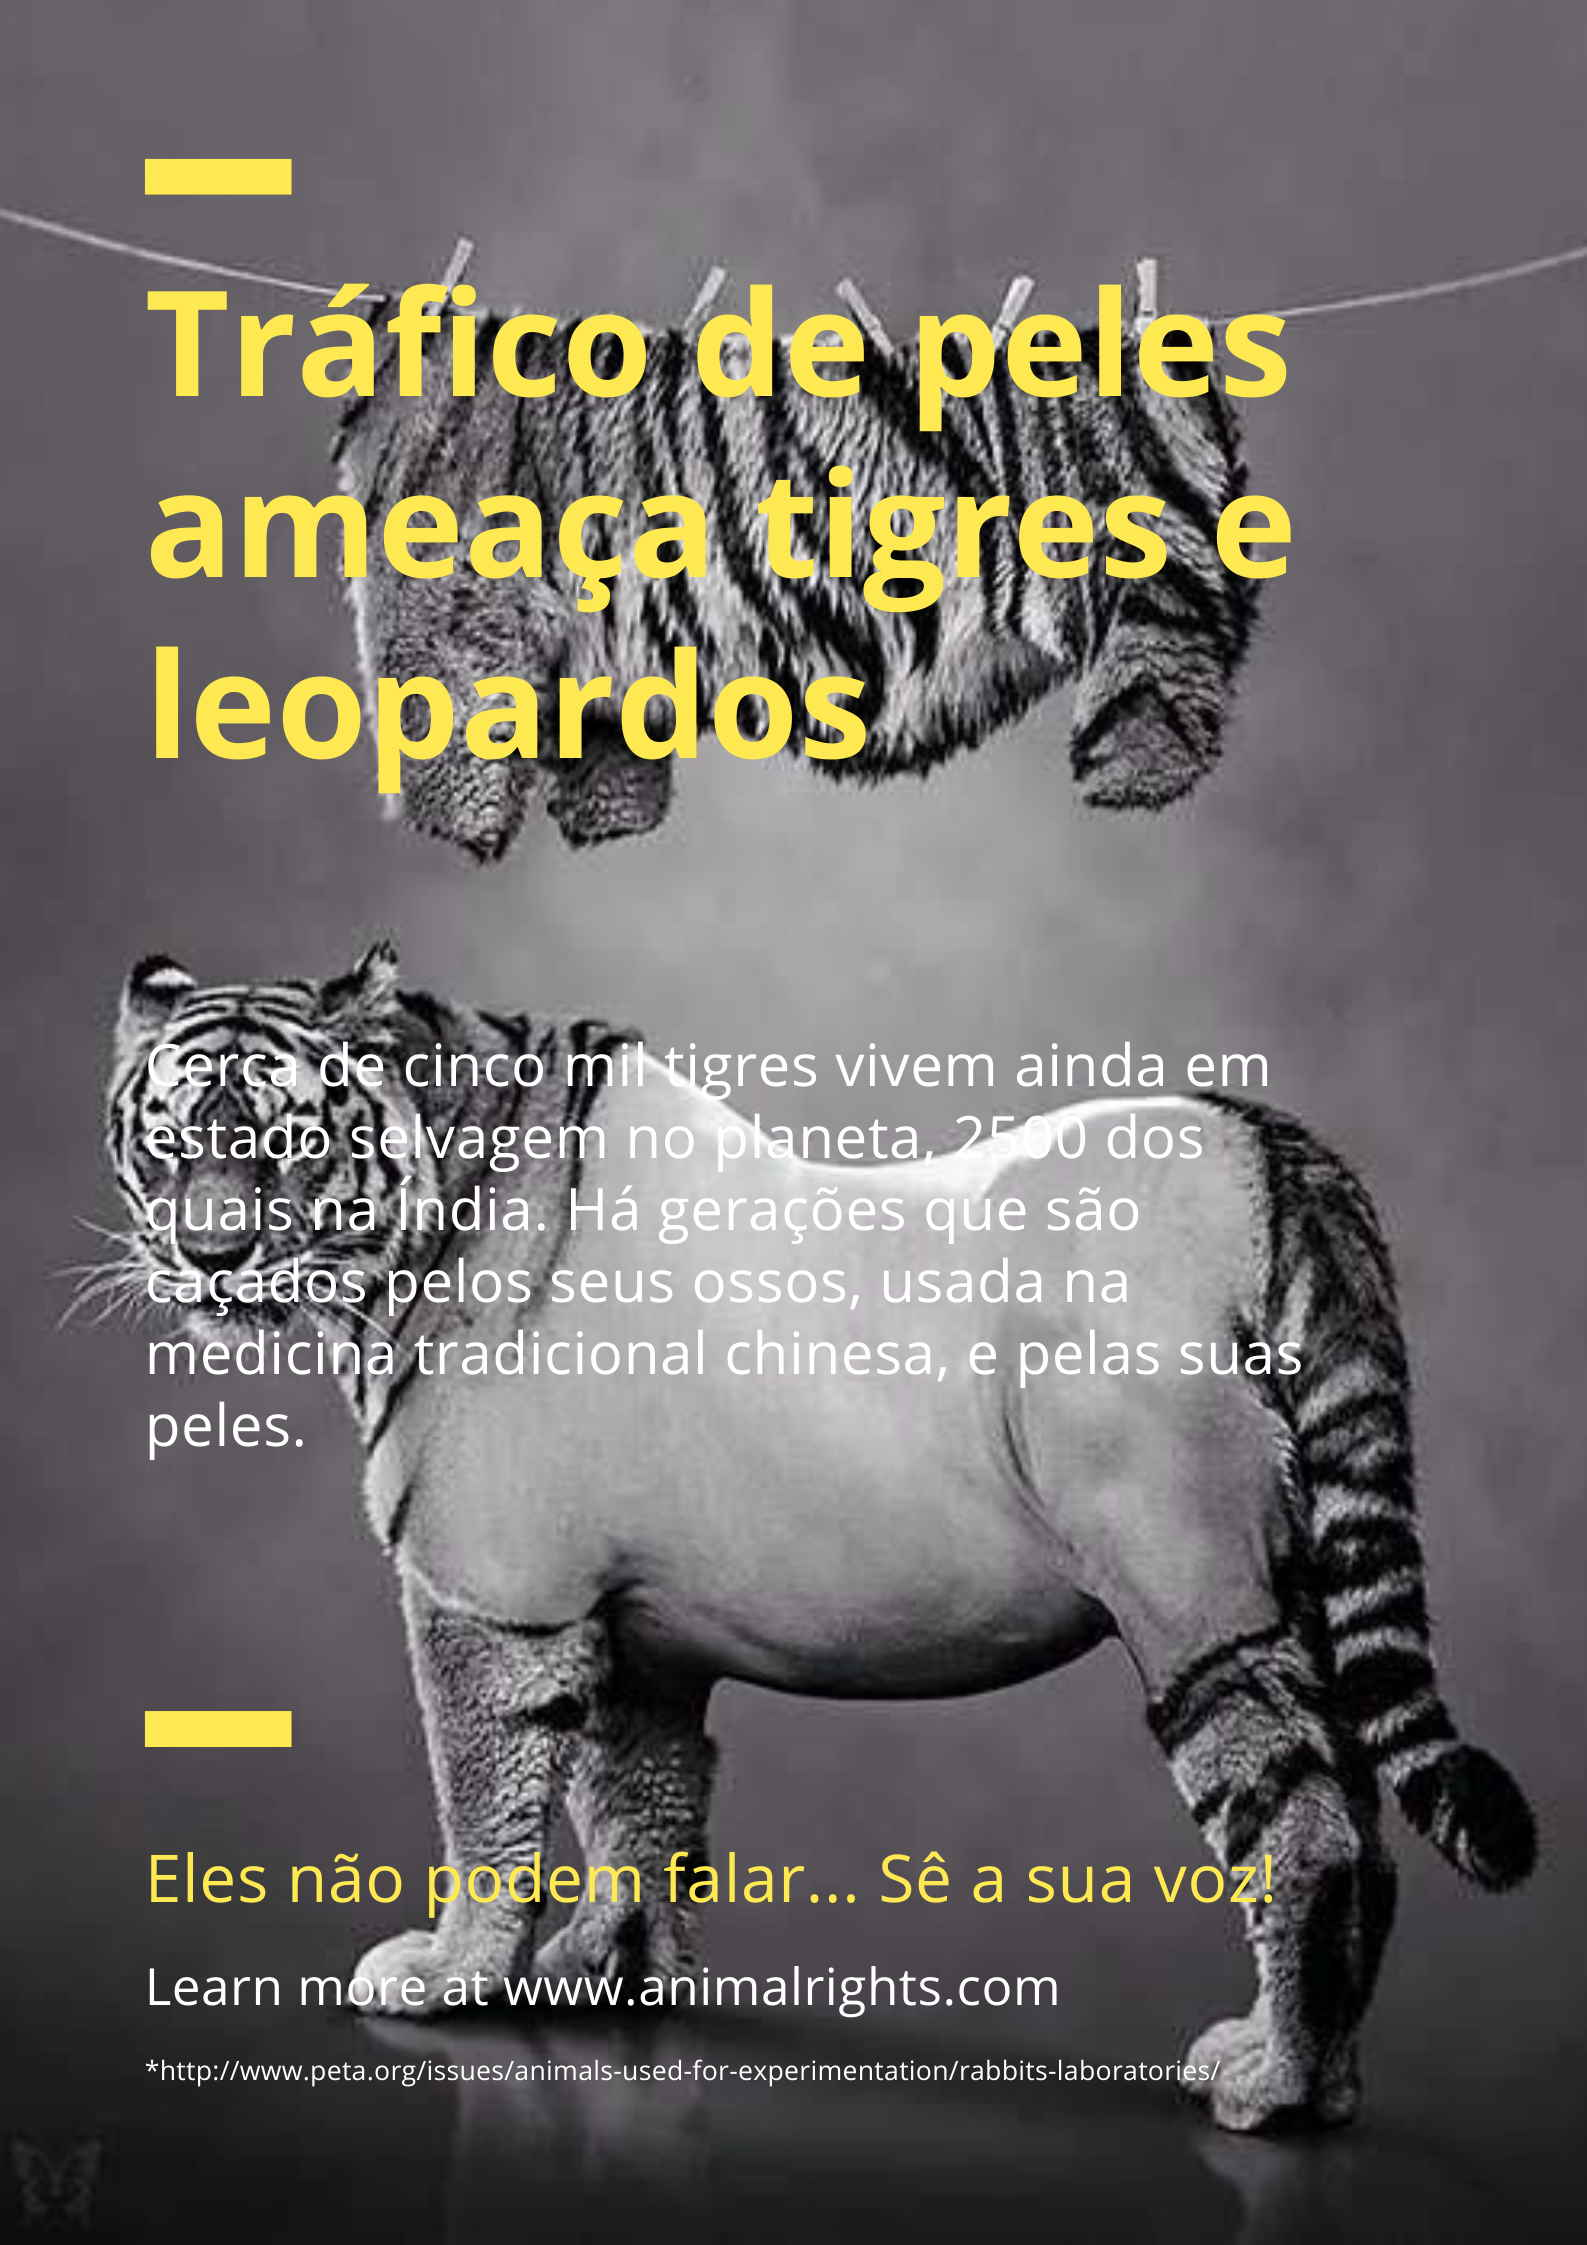 Blue & Yellow Animal Cruelty Awareness Rights Poster